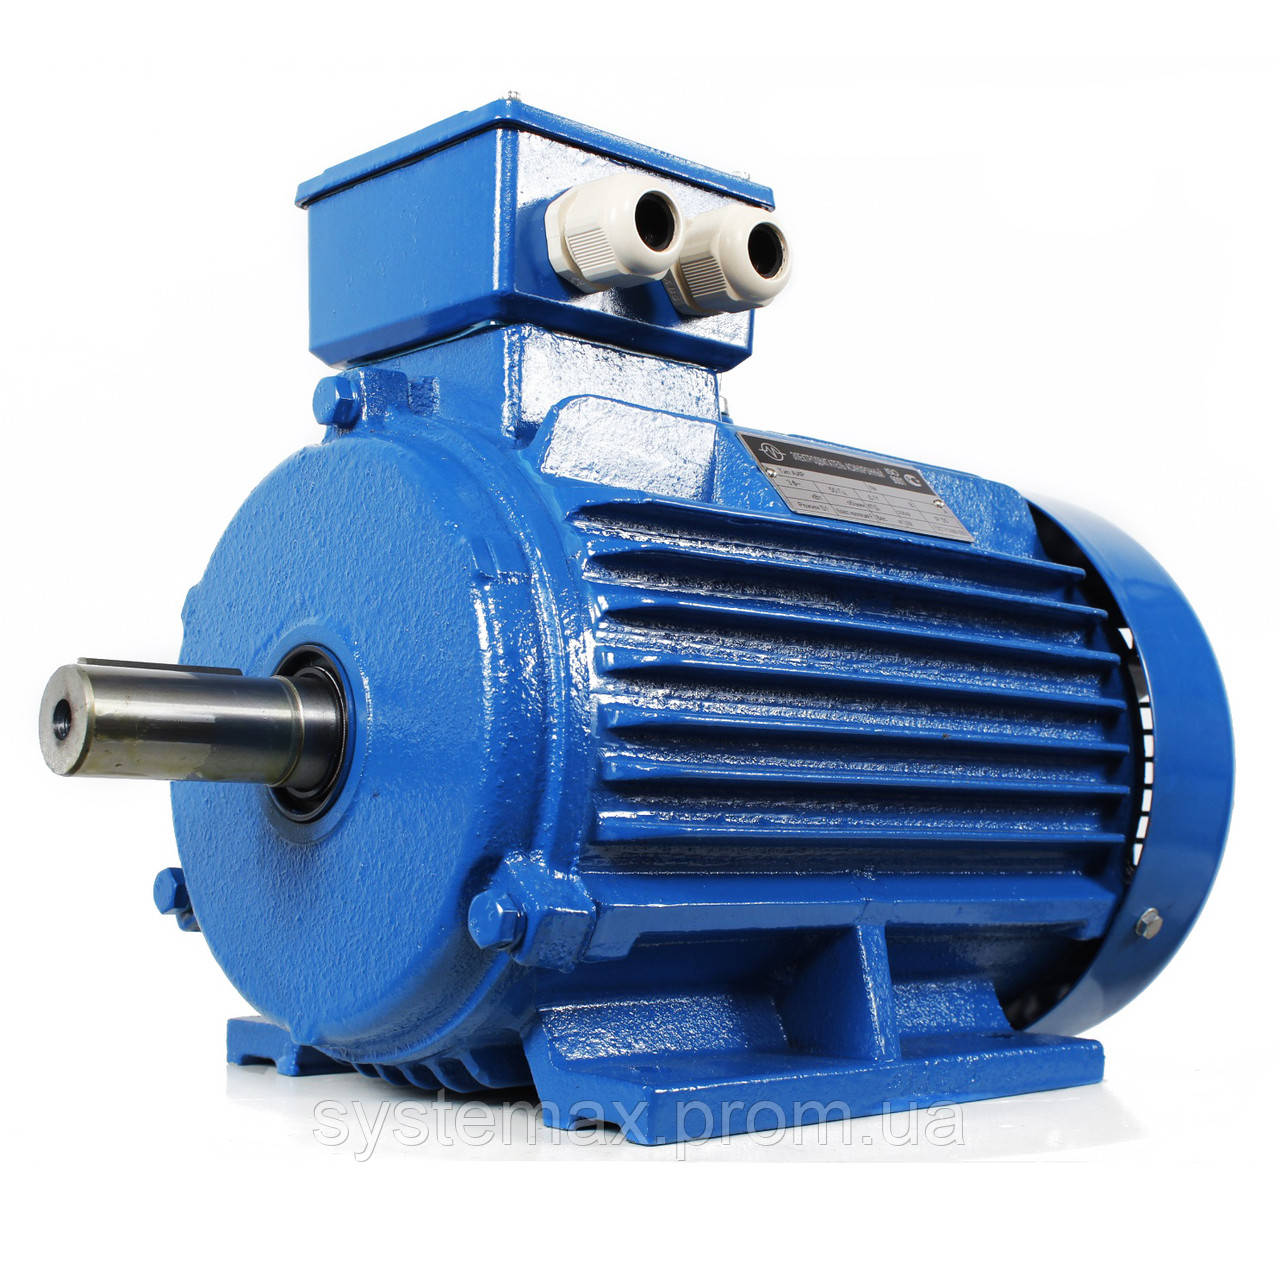 Электродвигатель АИР355MLС8 (АИР 355 MLС8) 315 кВт 750 об/мин